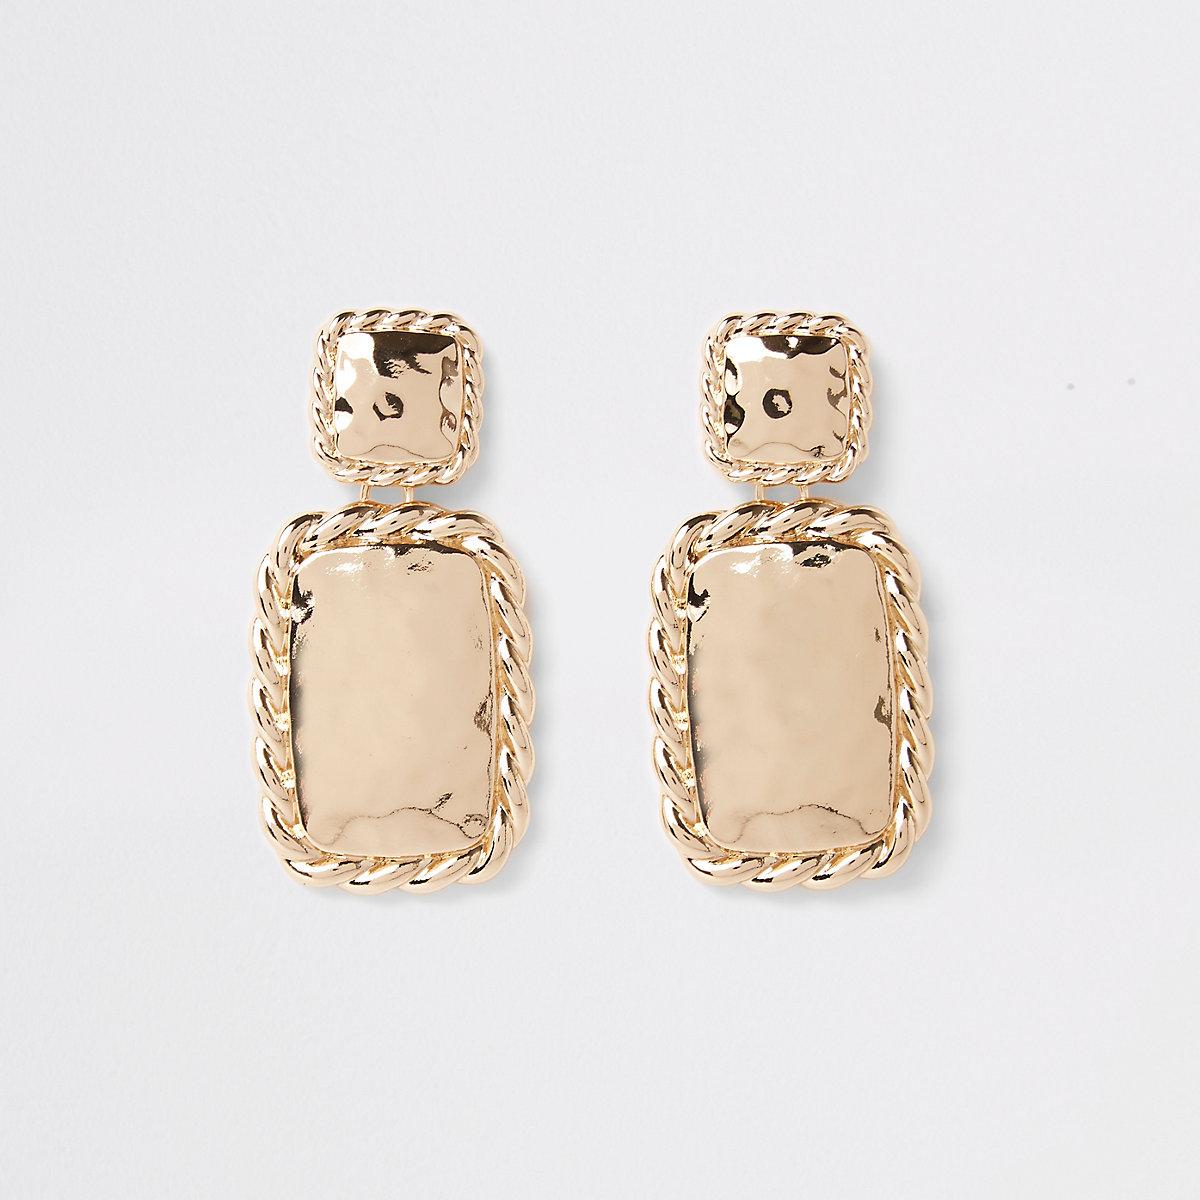 Gold color twist rectangle drop earrings